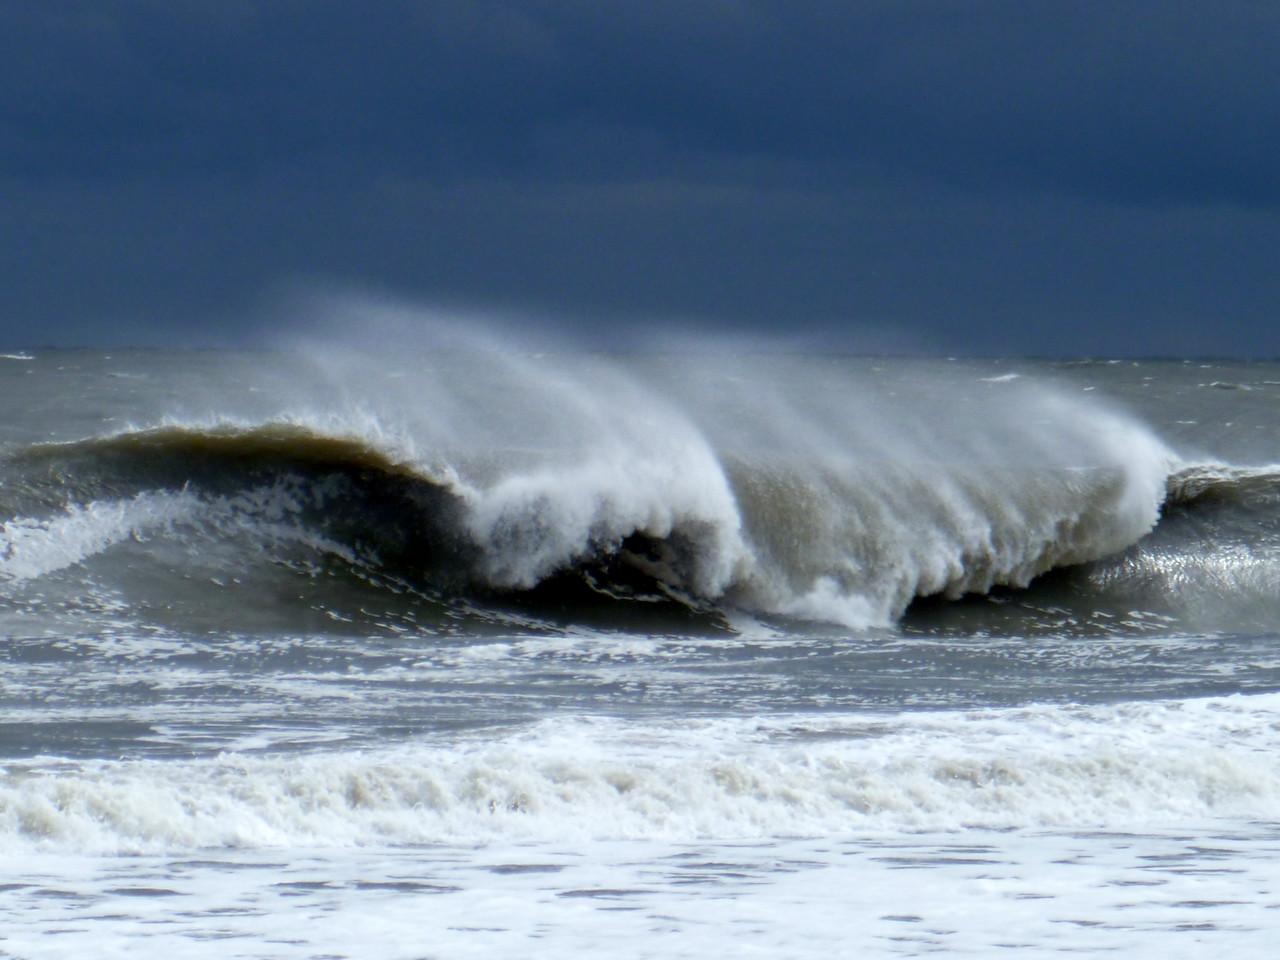 taken on Tues Oct 30, 2012 around 12 noon, Rehoboth Beach , DE